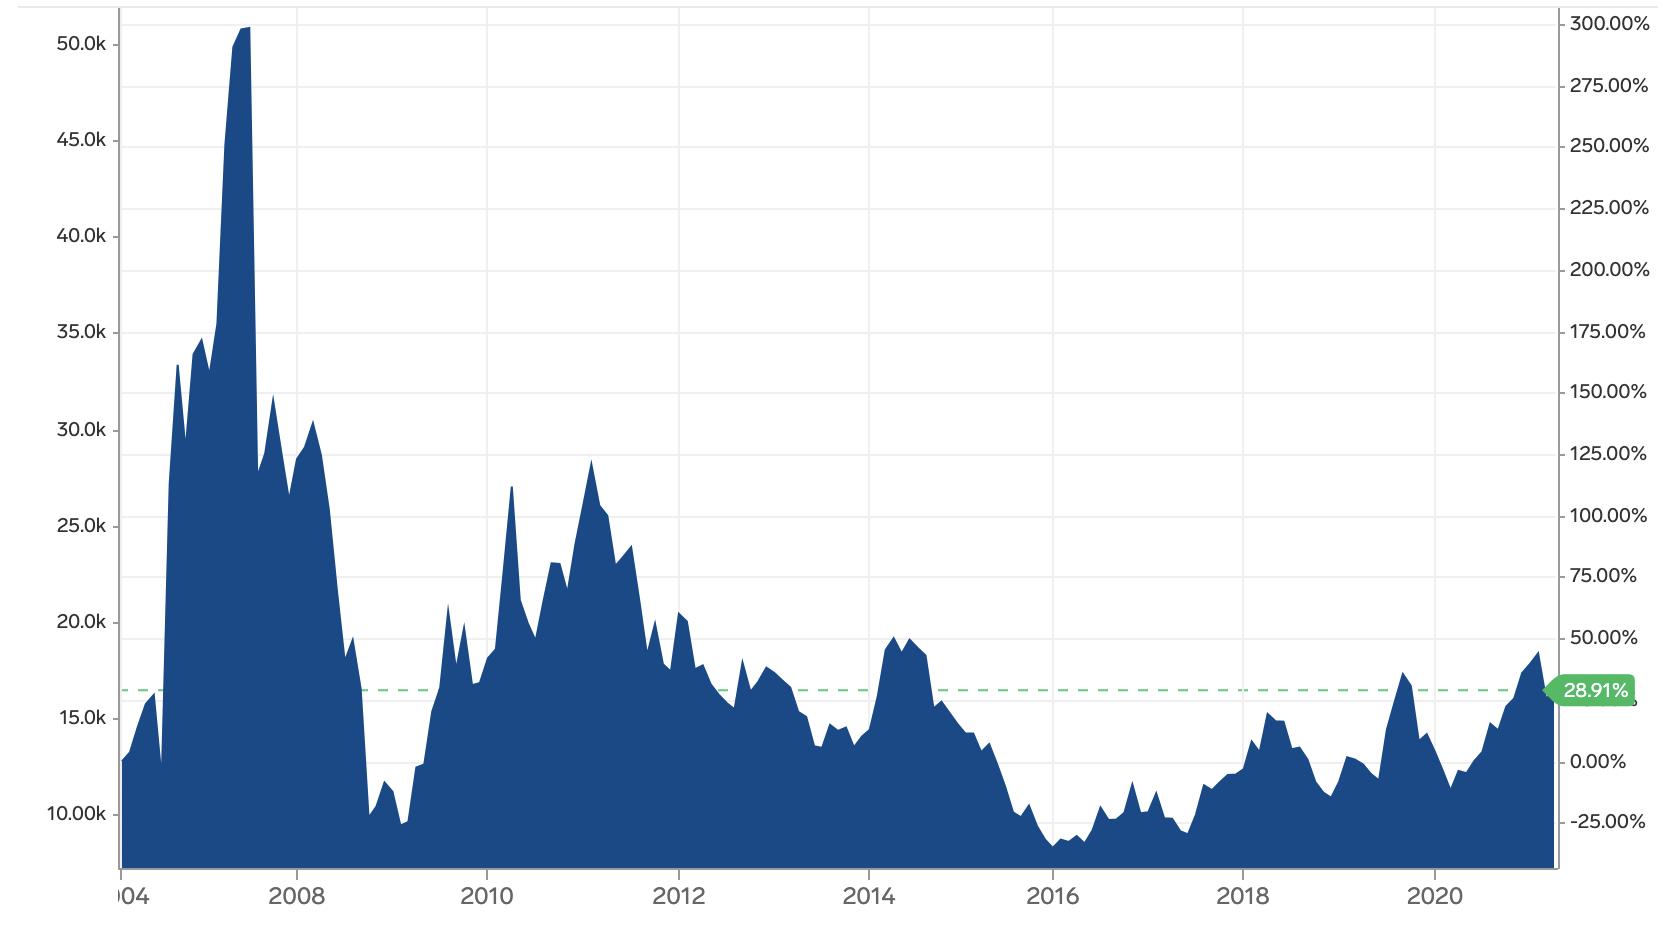 Figure 1: Nickel Spot Price Source: Market Insider